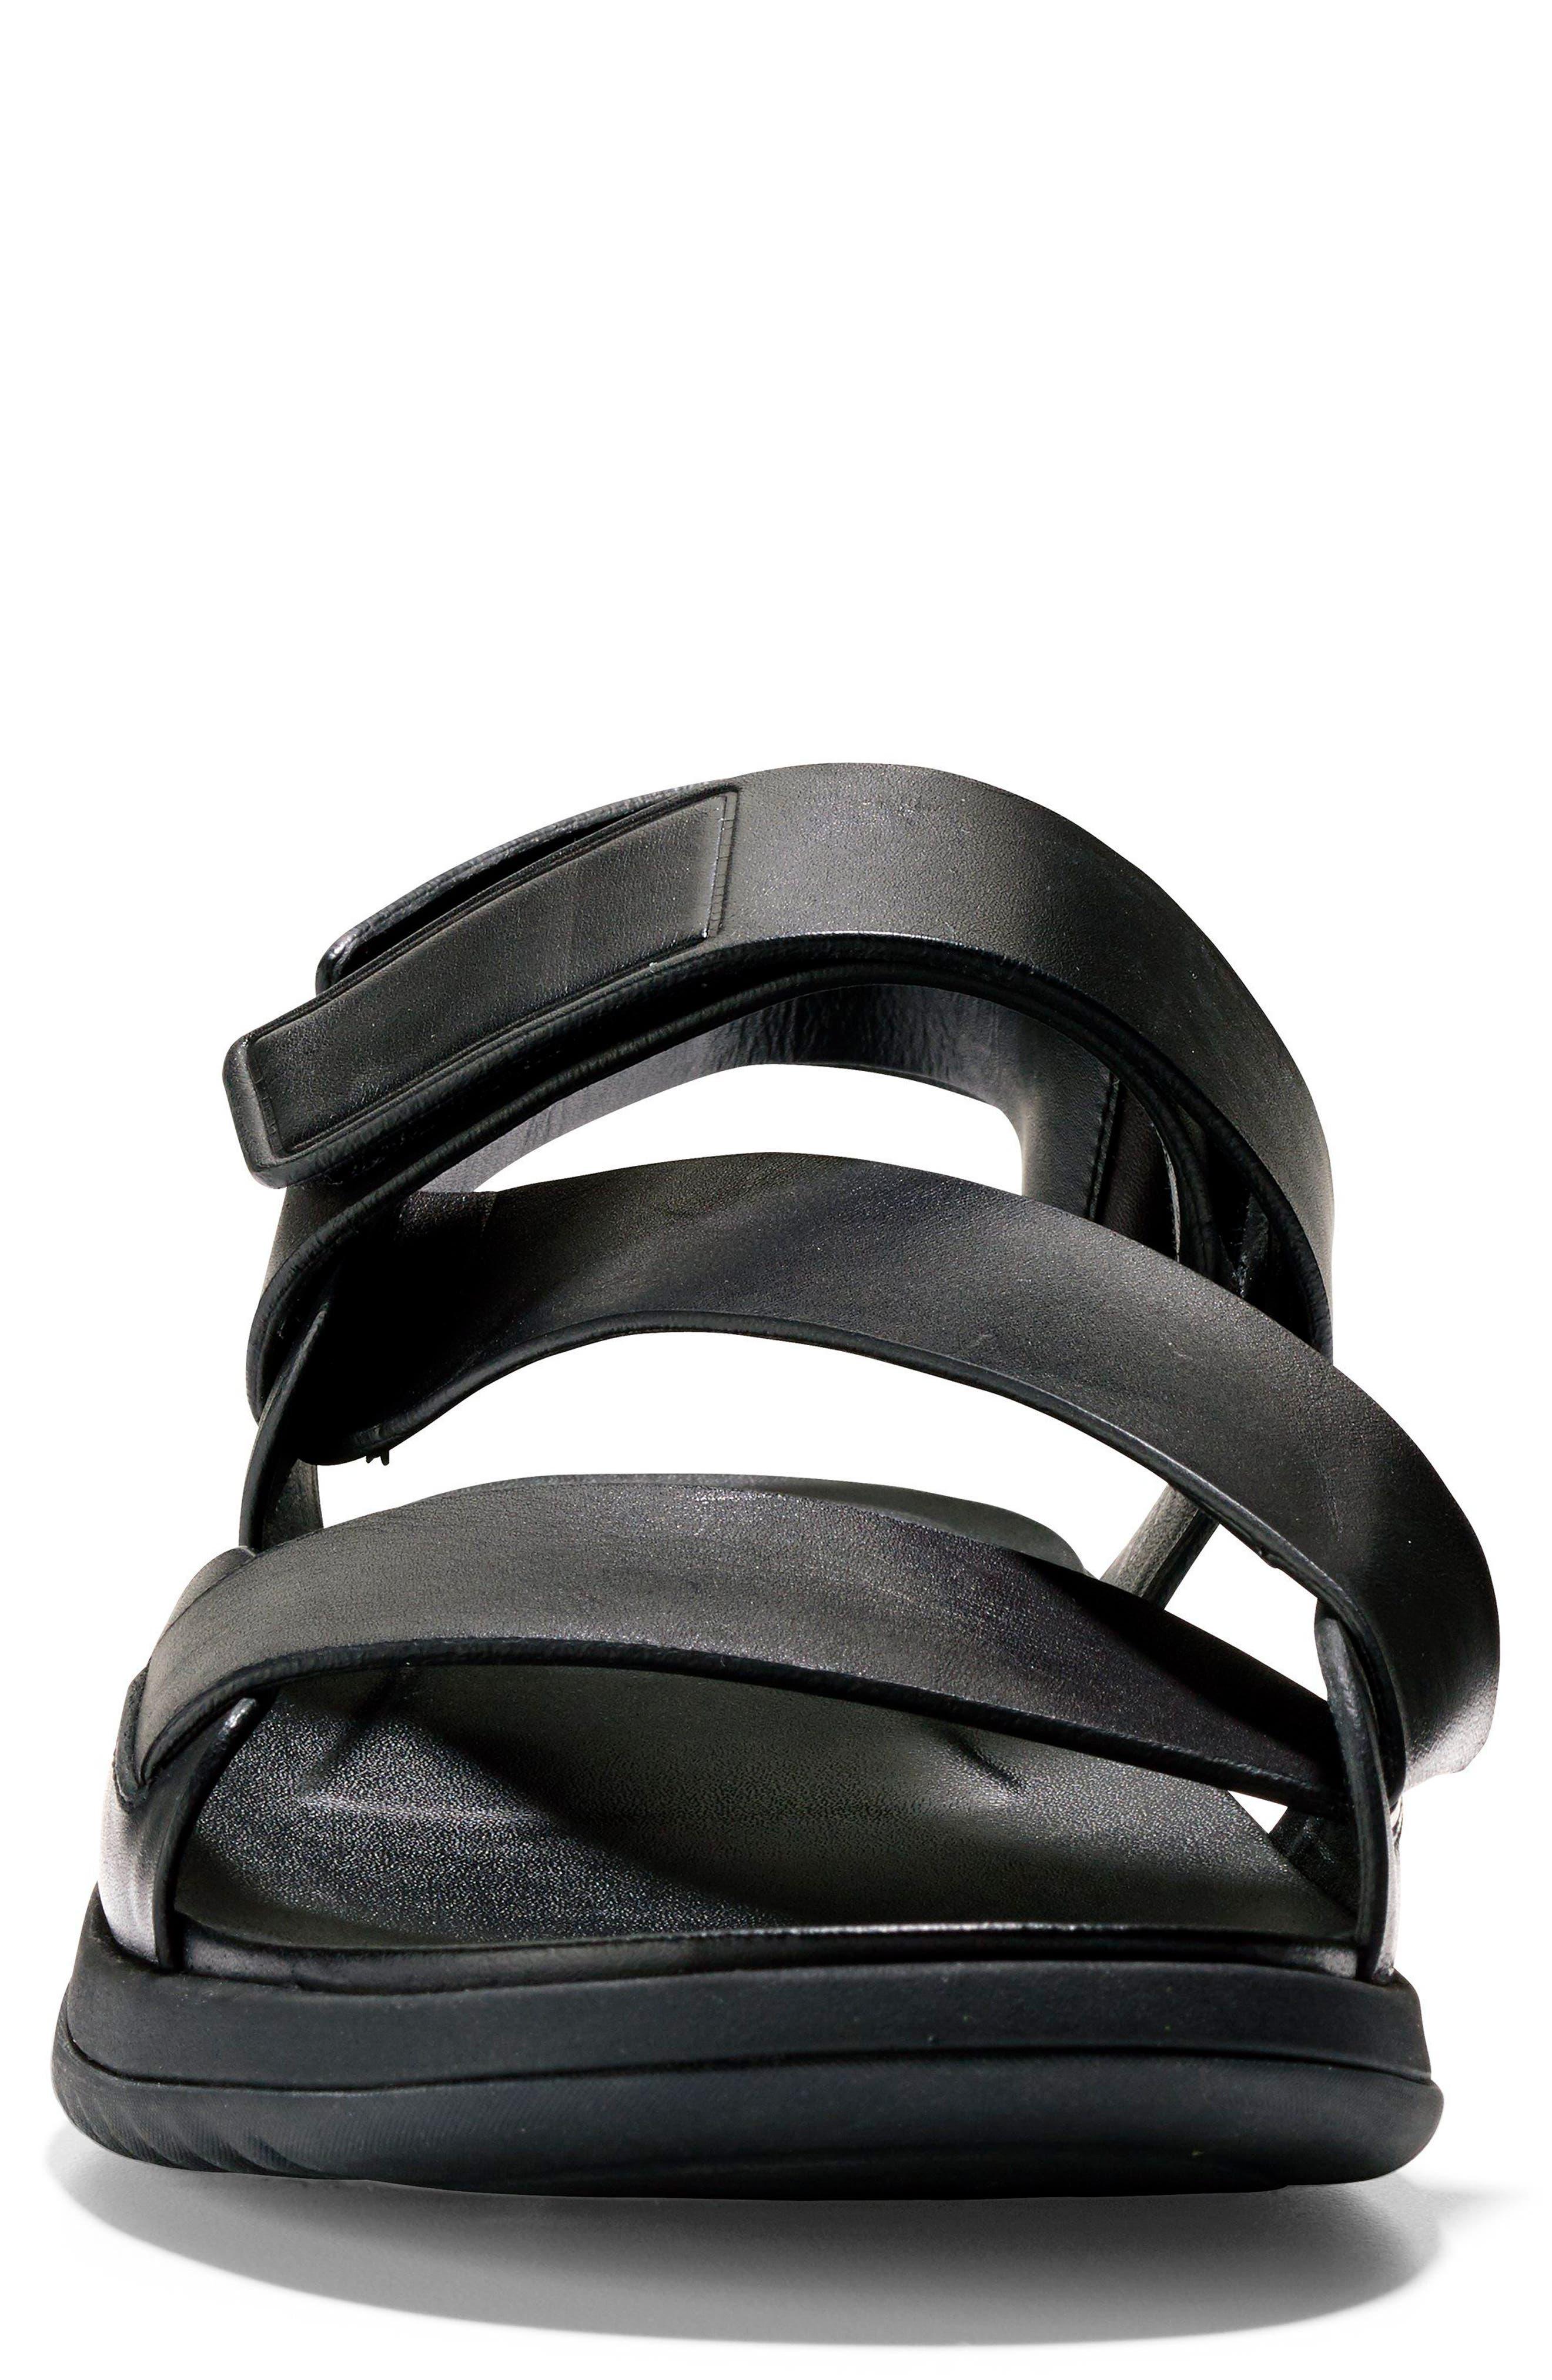 2.ZeroGrand Multistrap Sandal,                             Alternate thumbnail 4, color,                             003